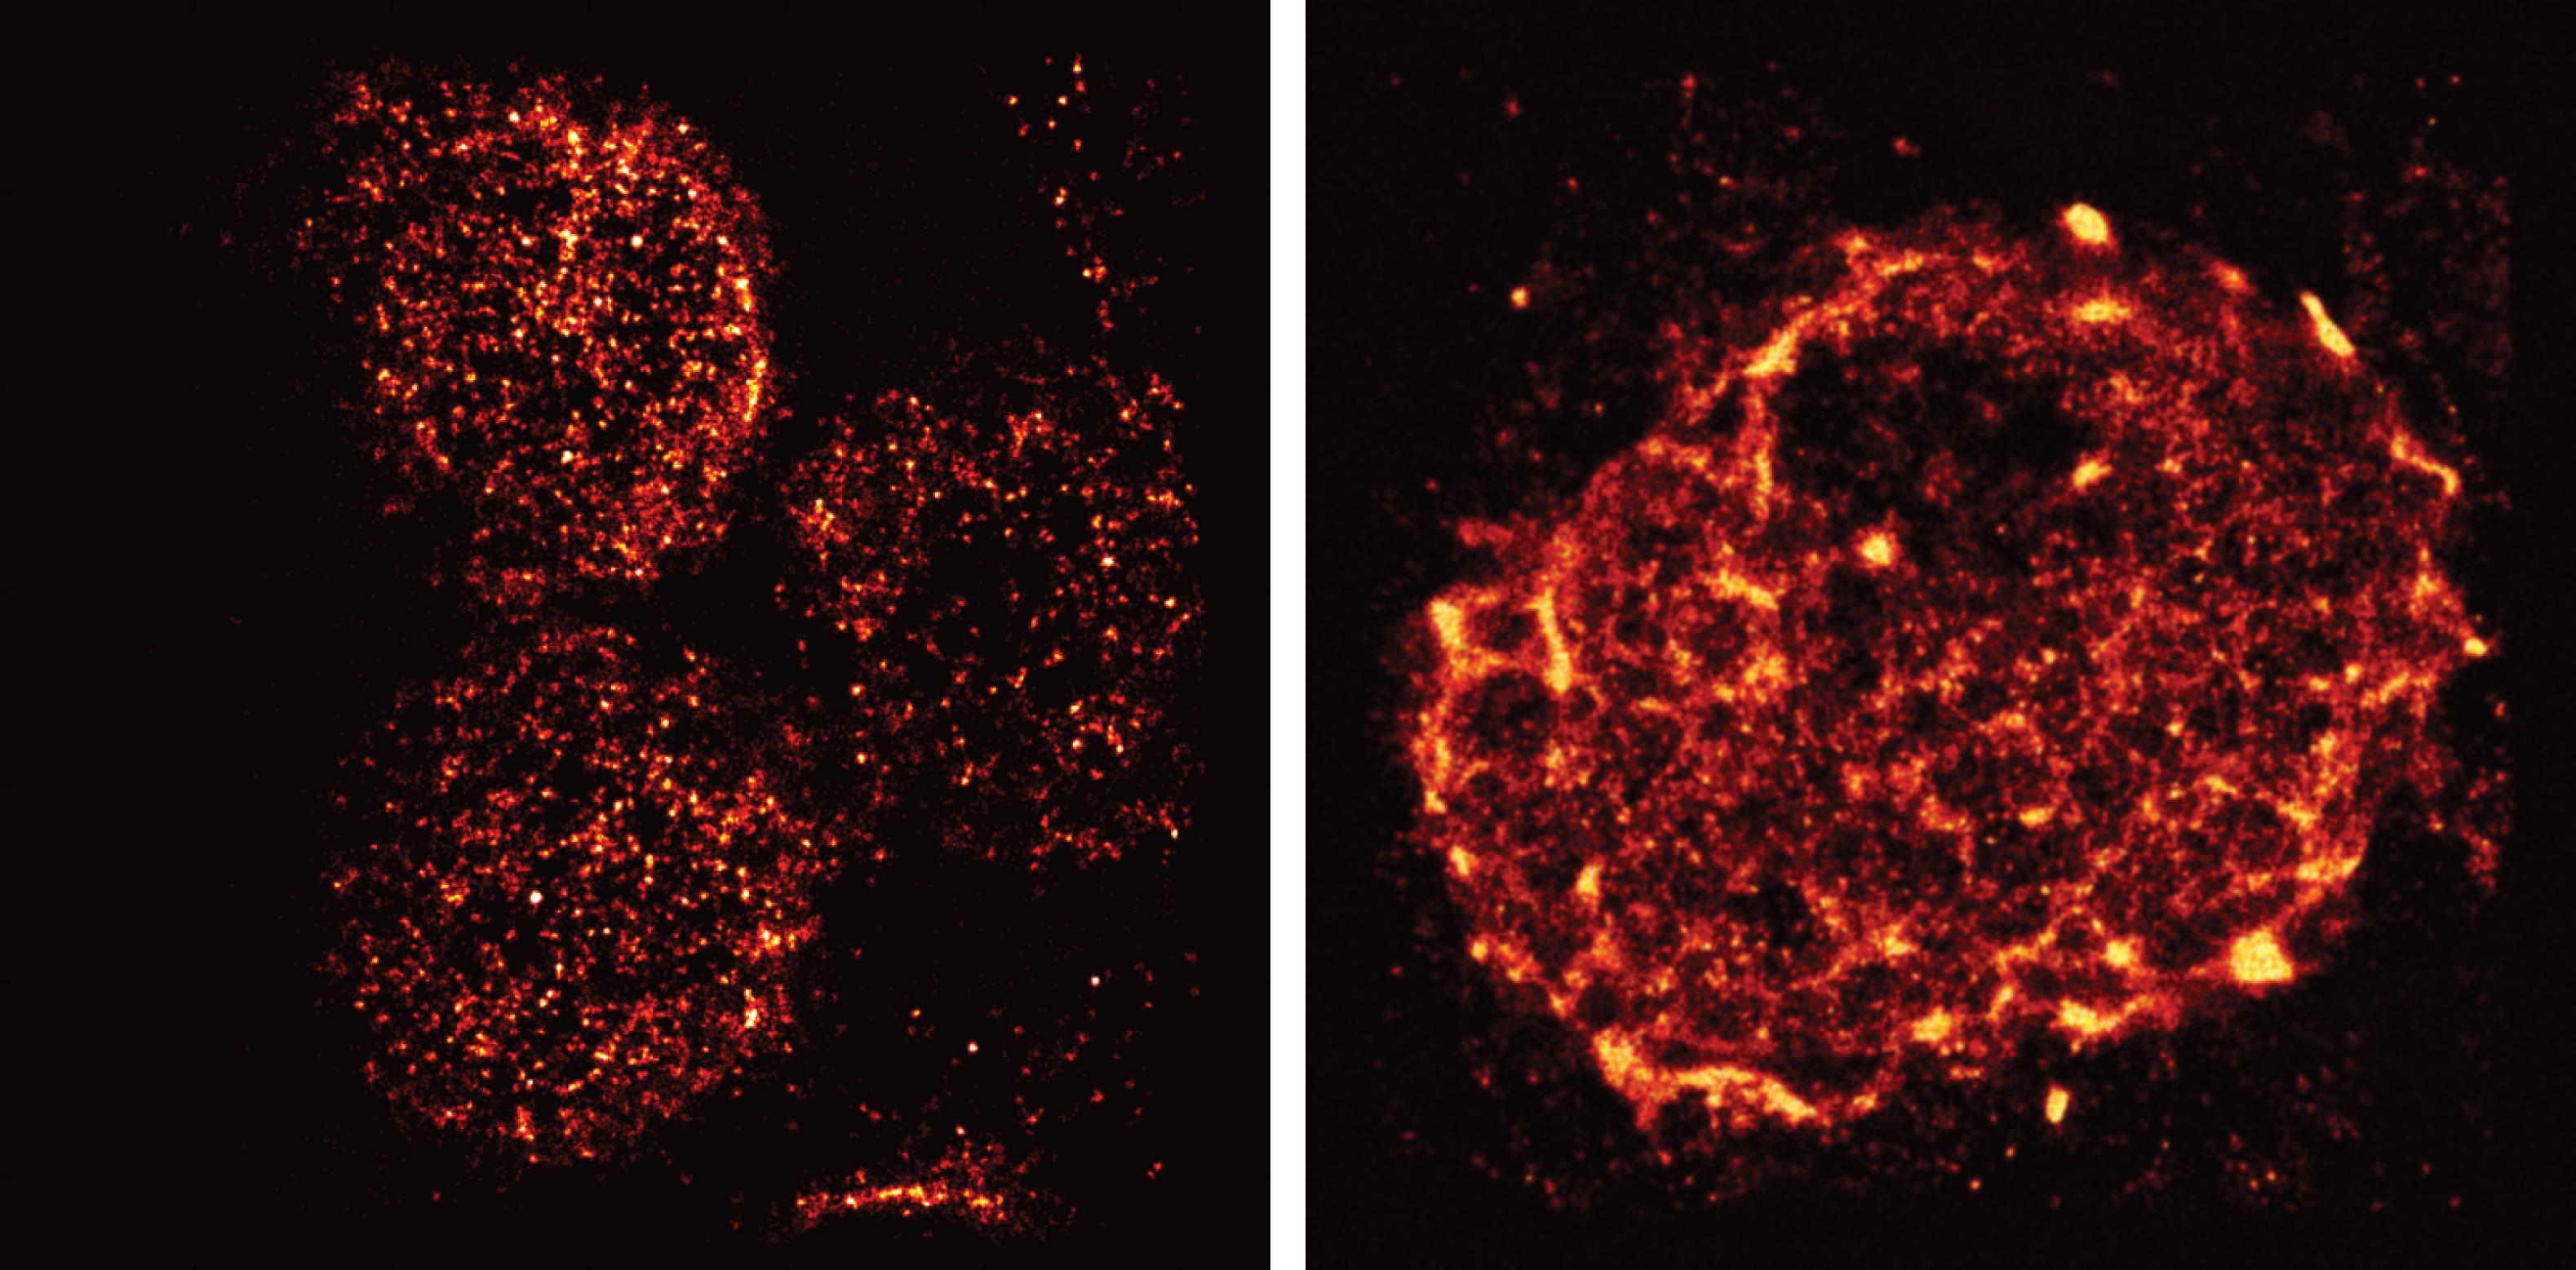 Super Resolution Microscopy Reveals Unprecedented Detail